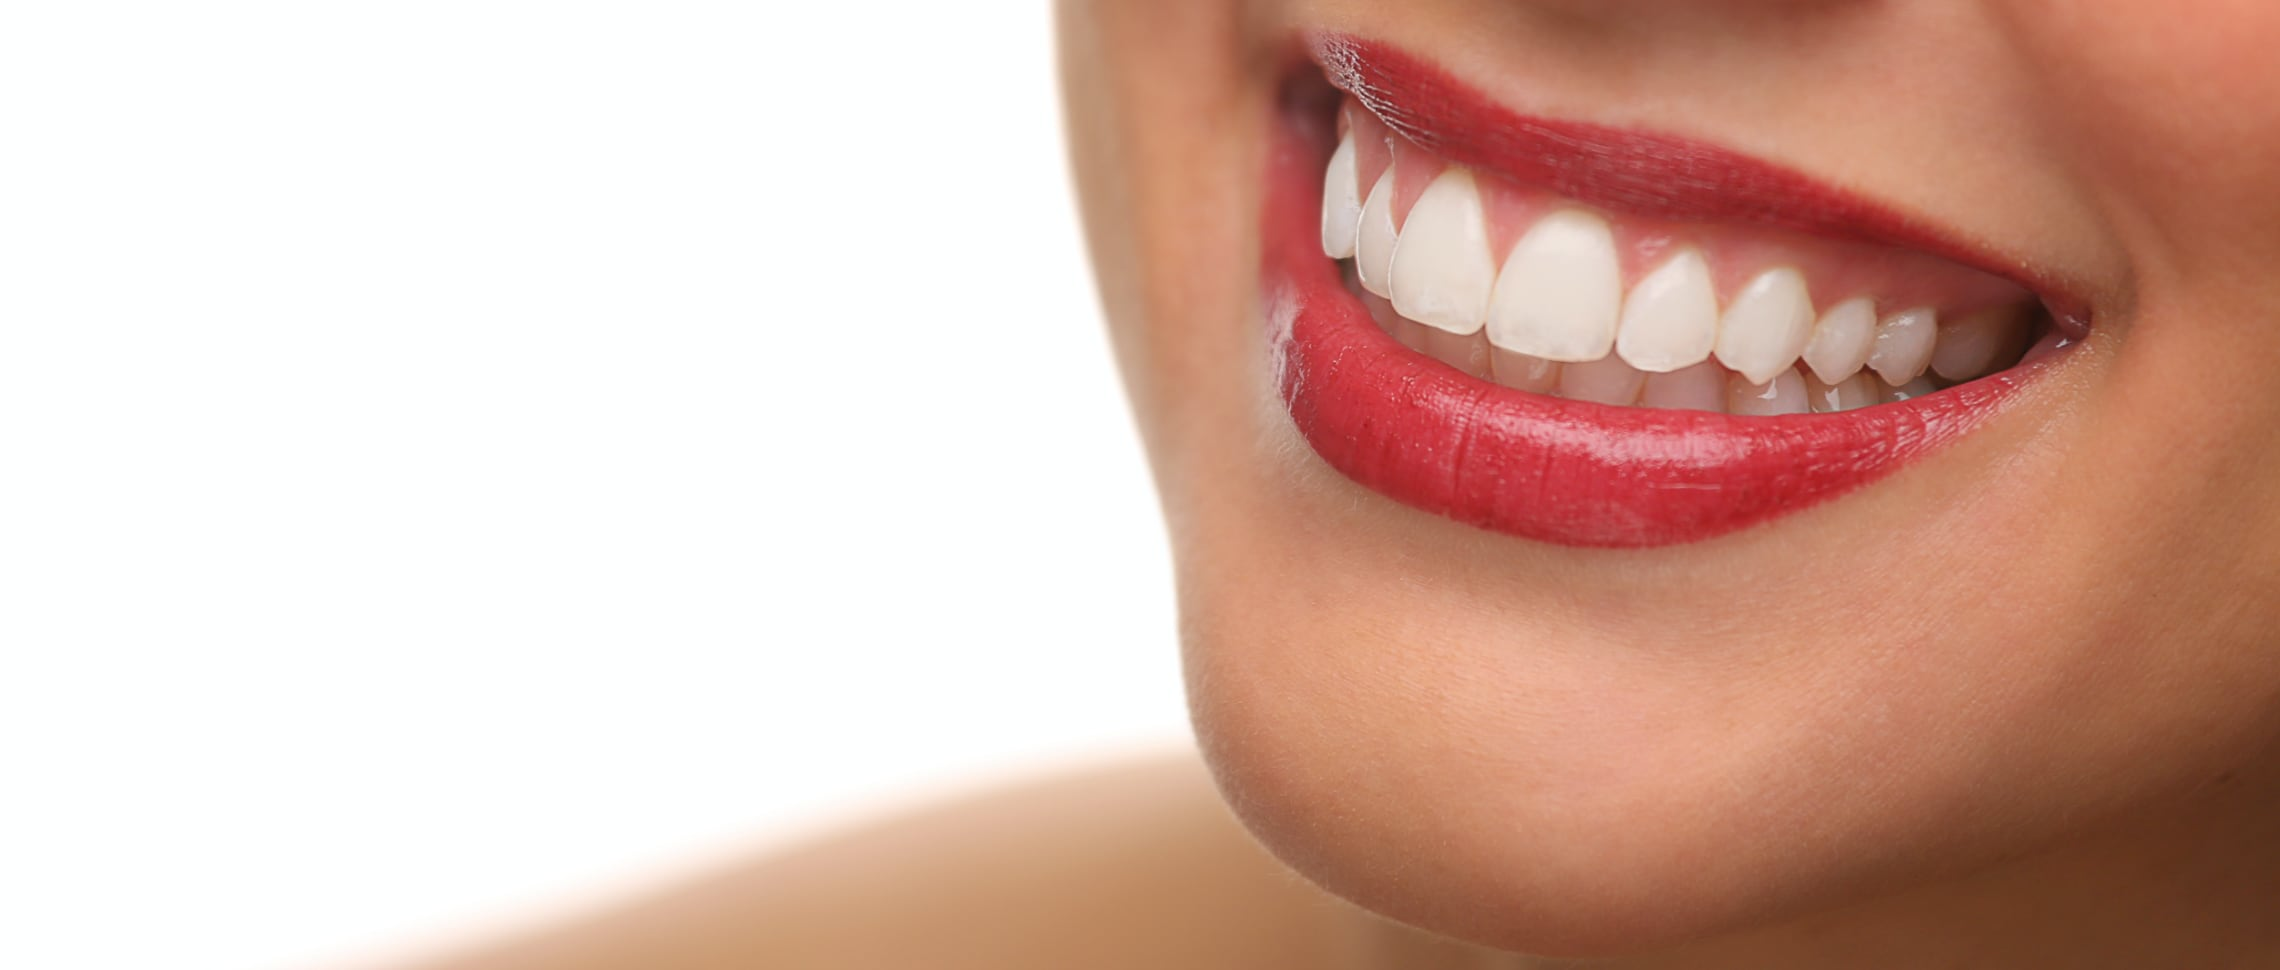 tandblekning-bra-pris-västerås-tänder-leende